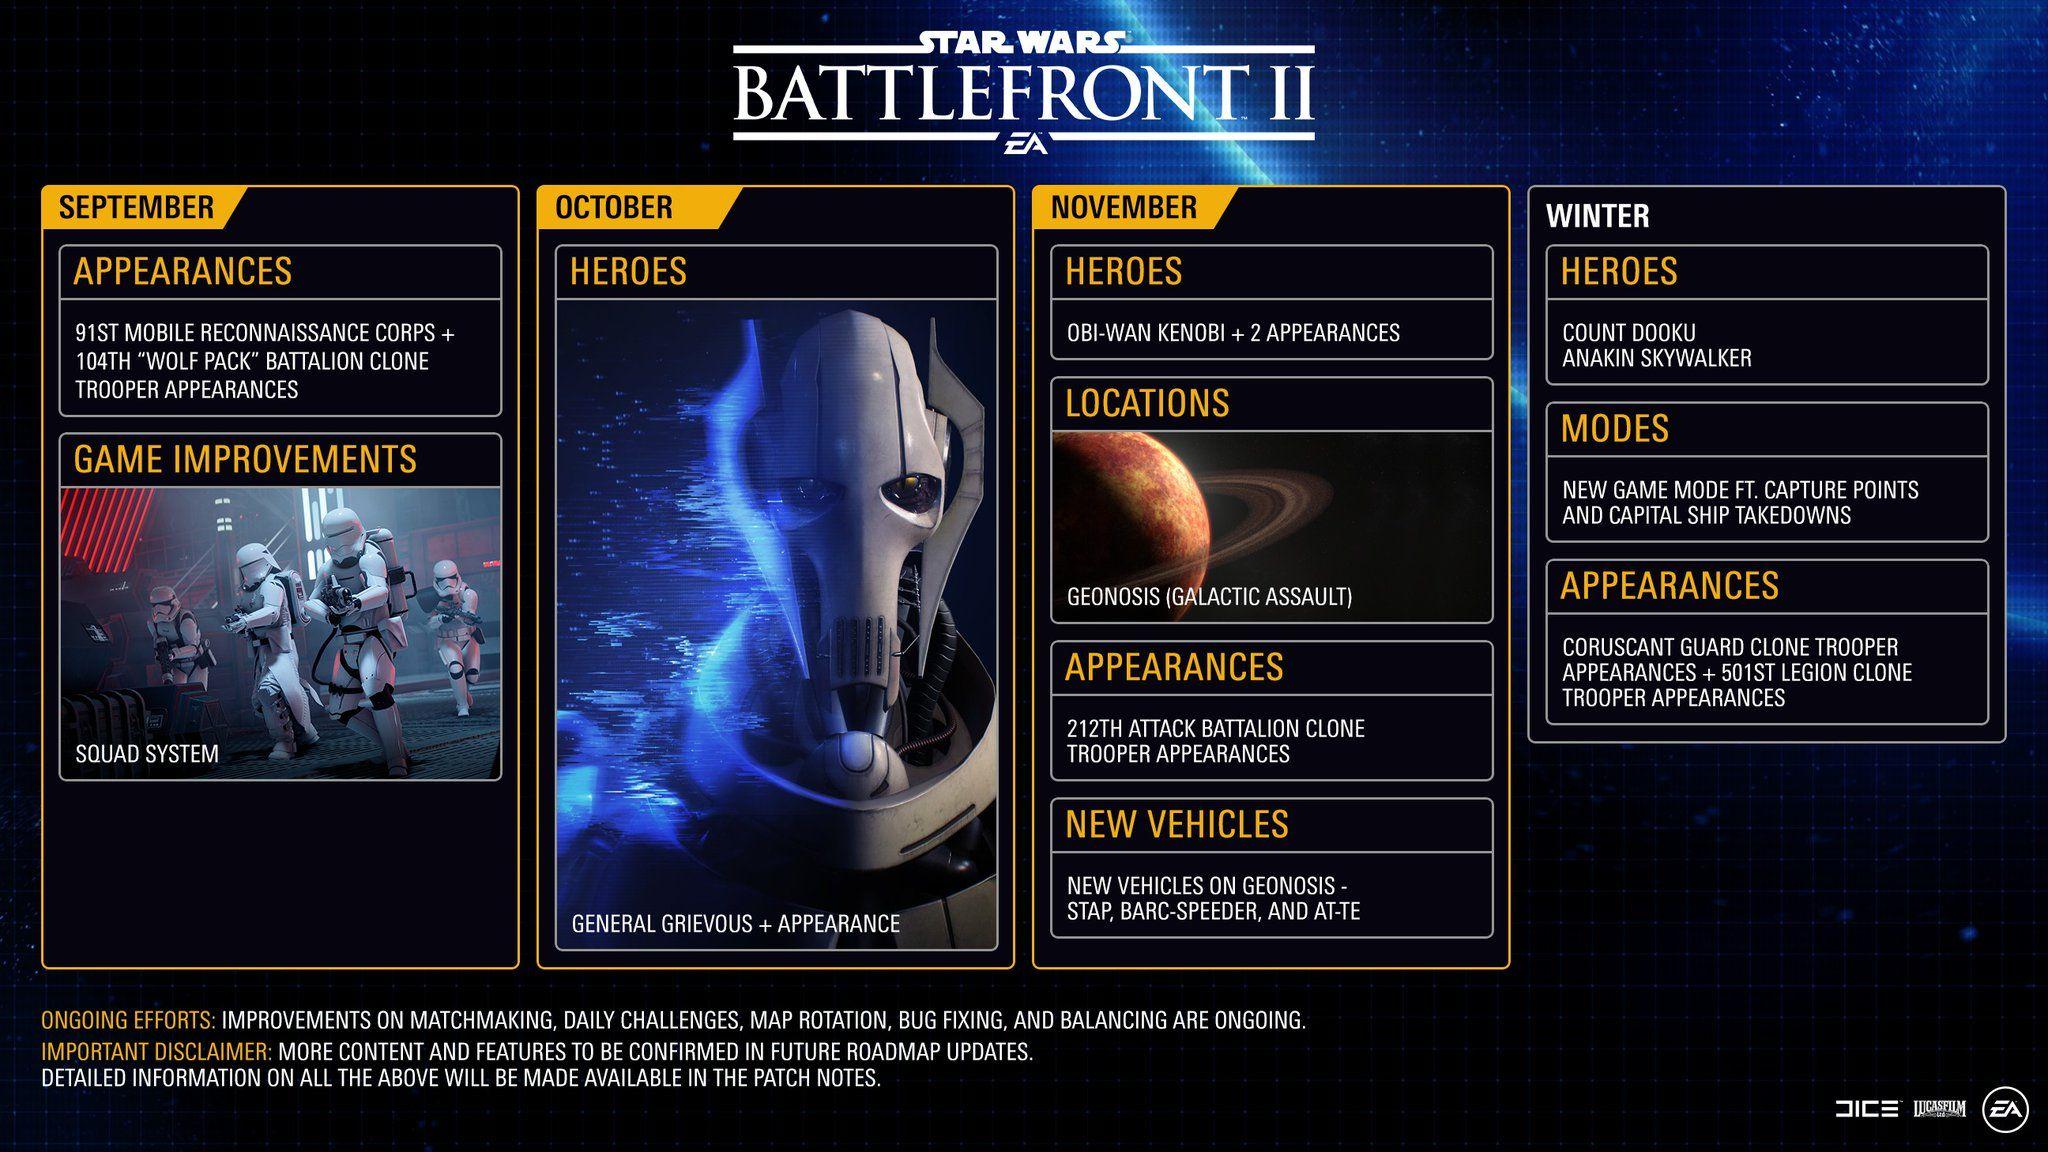 Star Wars Battlefront 2' Roadmap Update Details Clone Wars Hero Releases